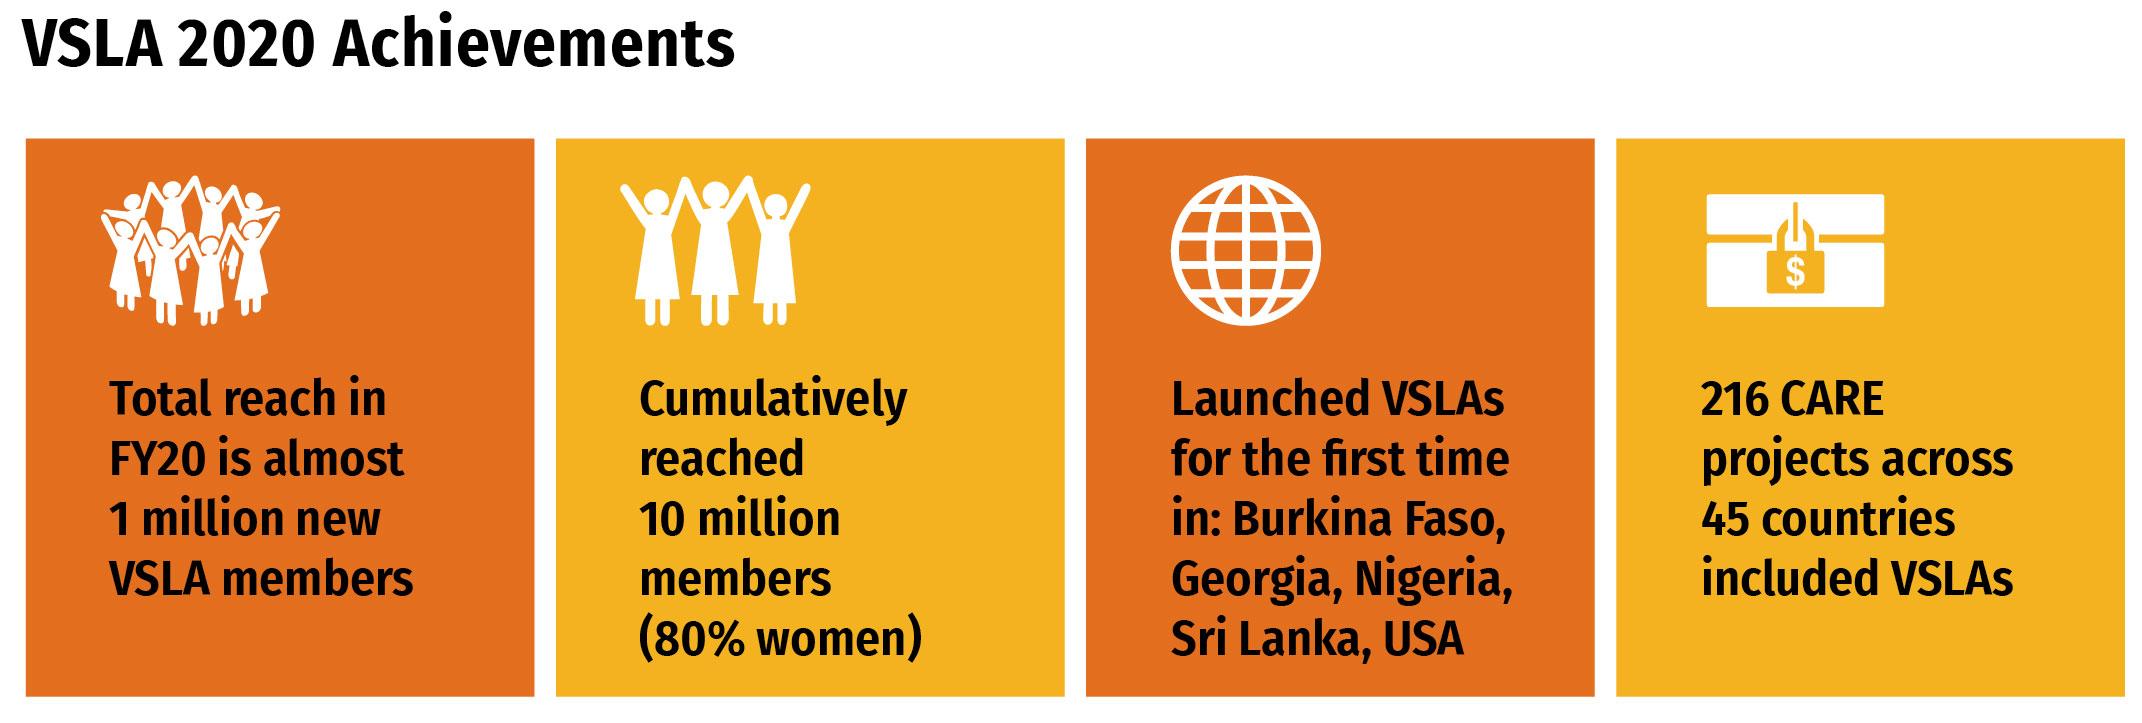 Infographic: VSLA 2020 Achievements